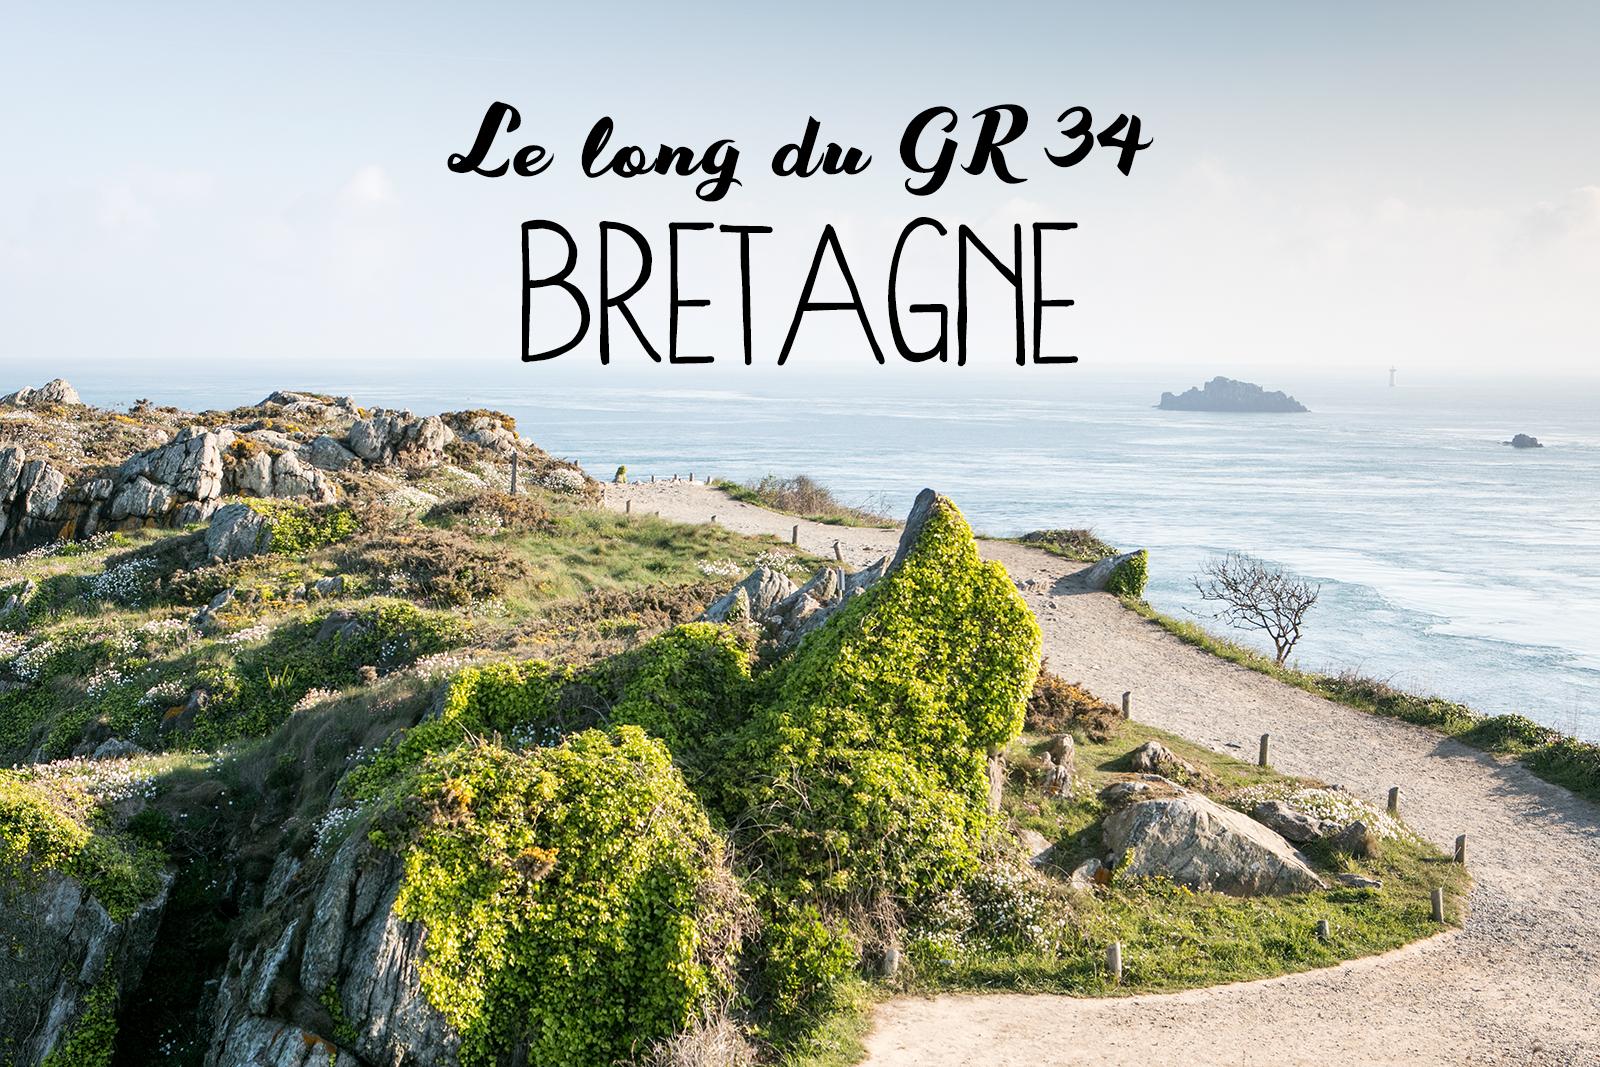 randonnee-bretagne-gr34